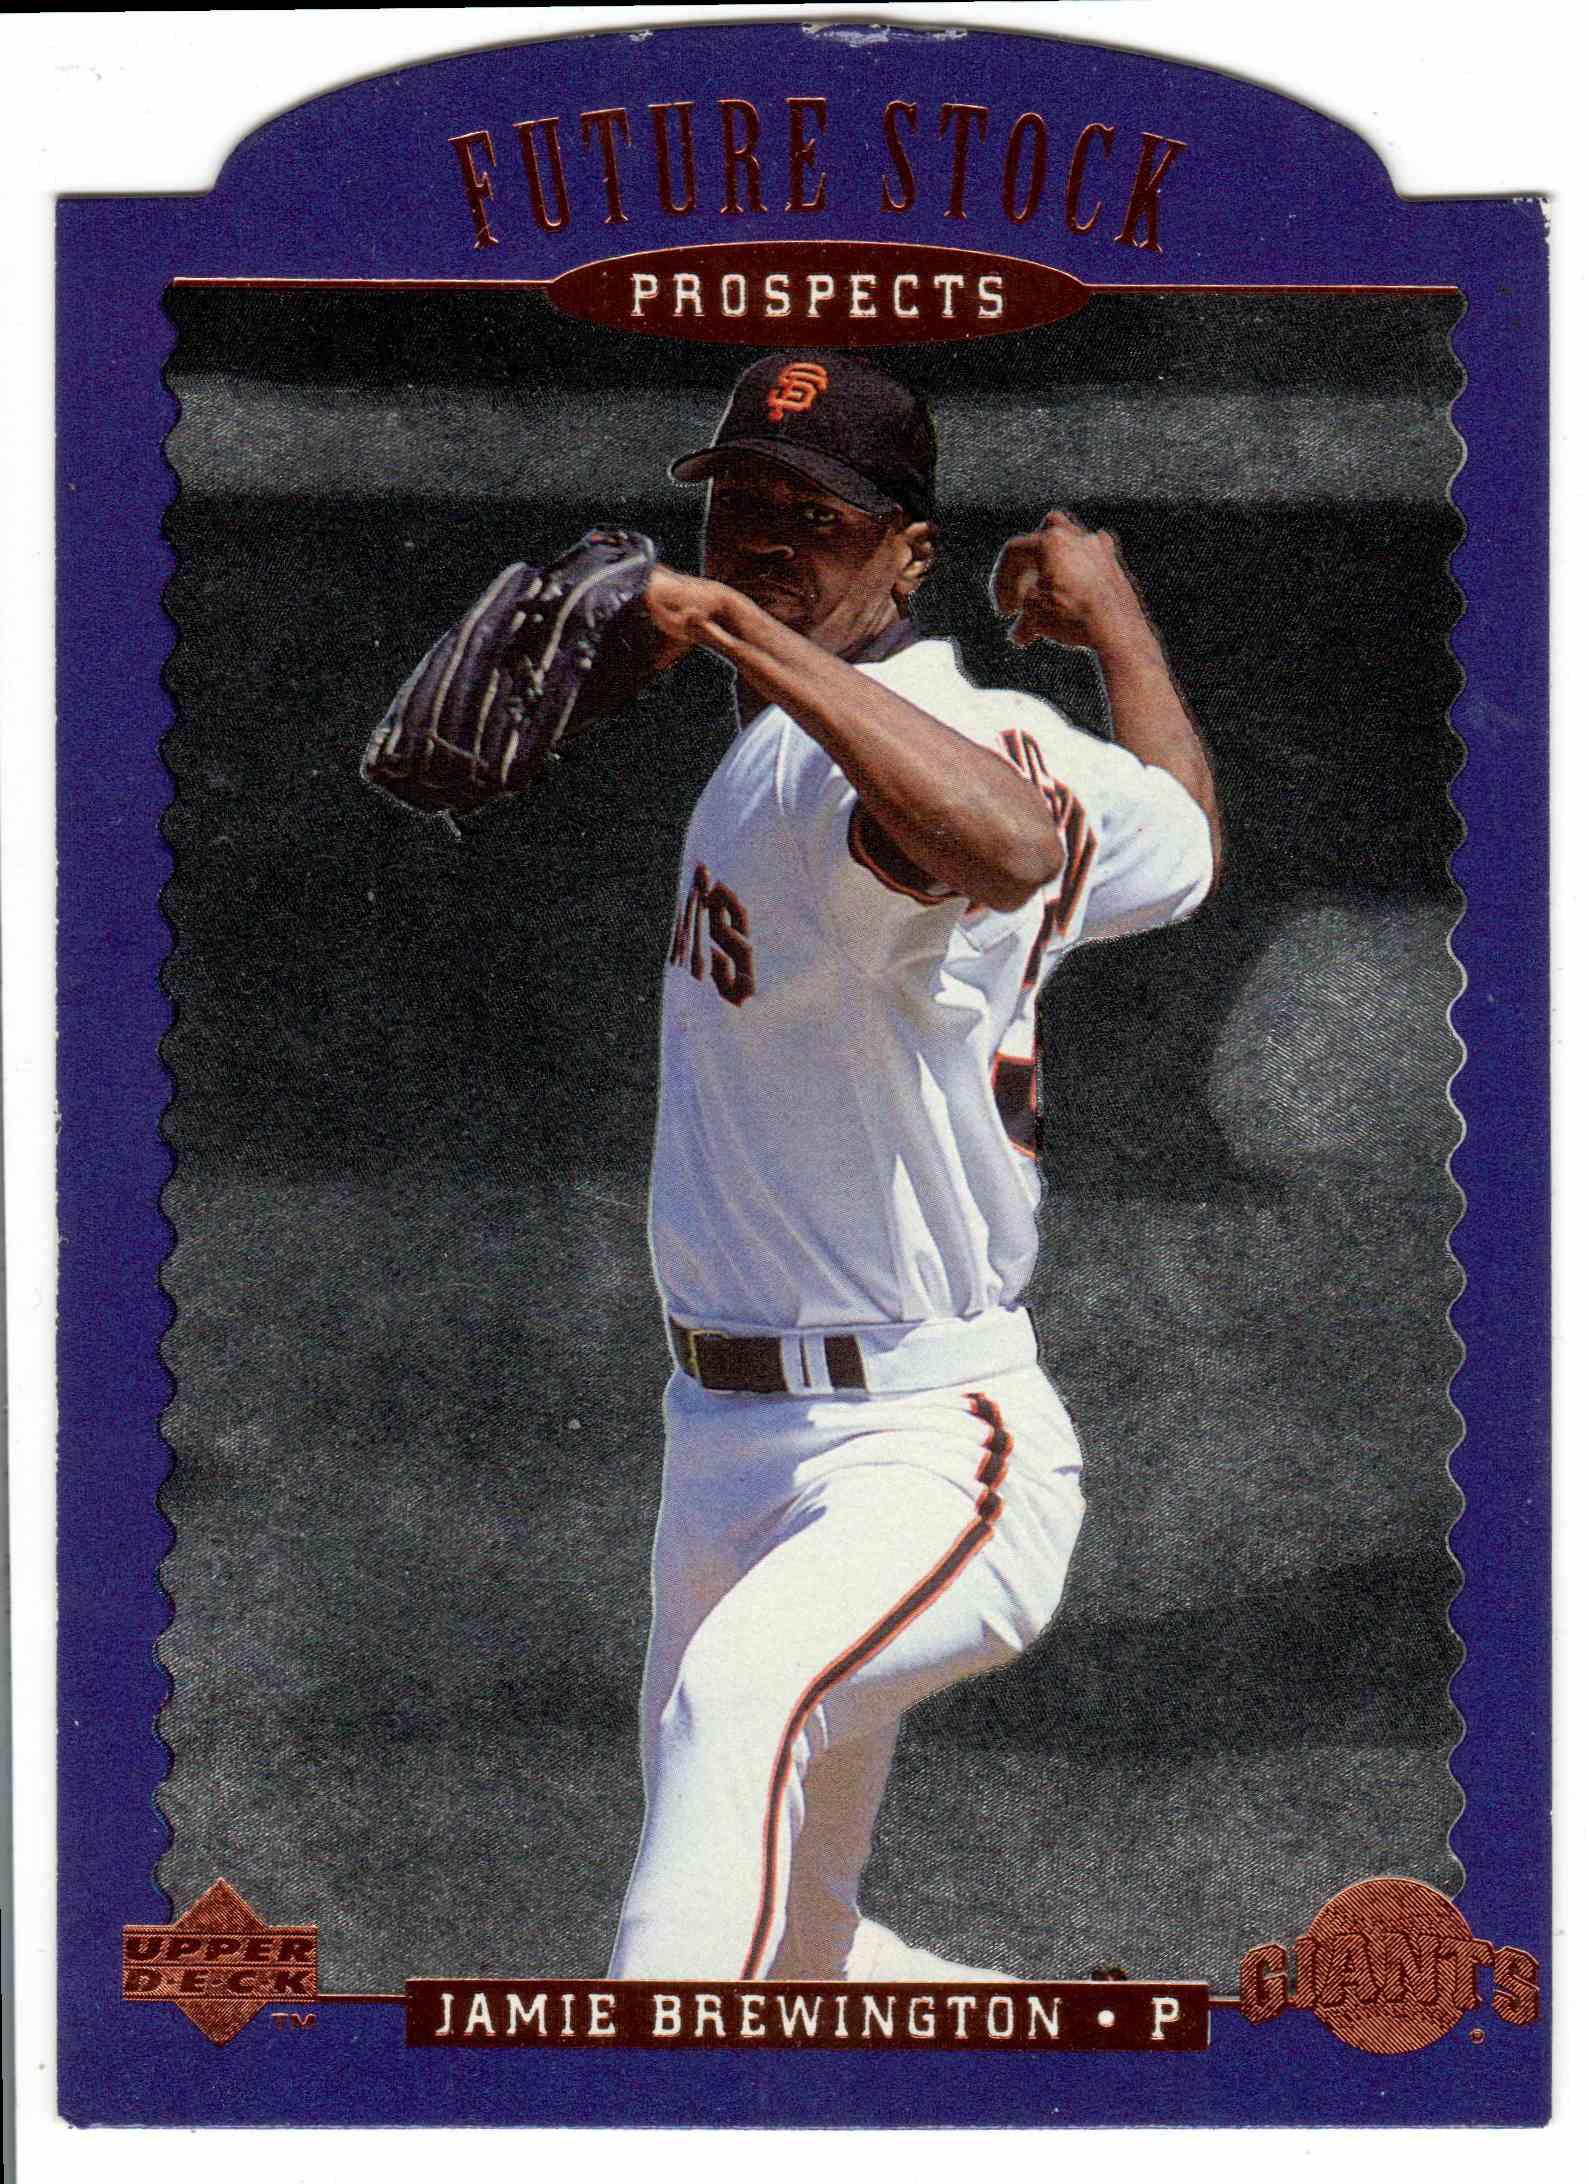 1996 Upper Deck Jamie Brewington #FS5 card front image